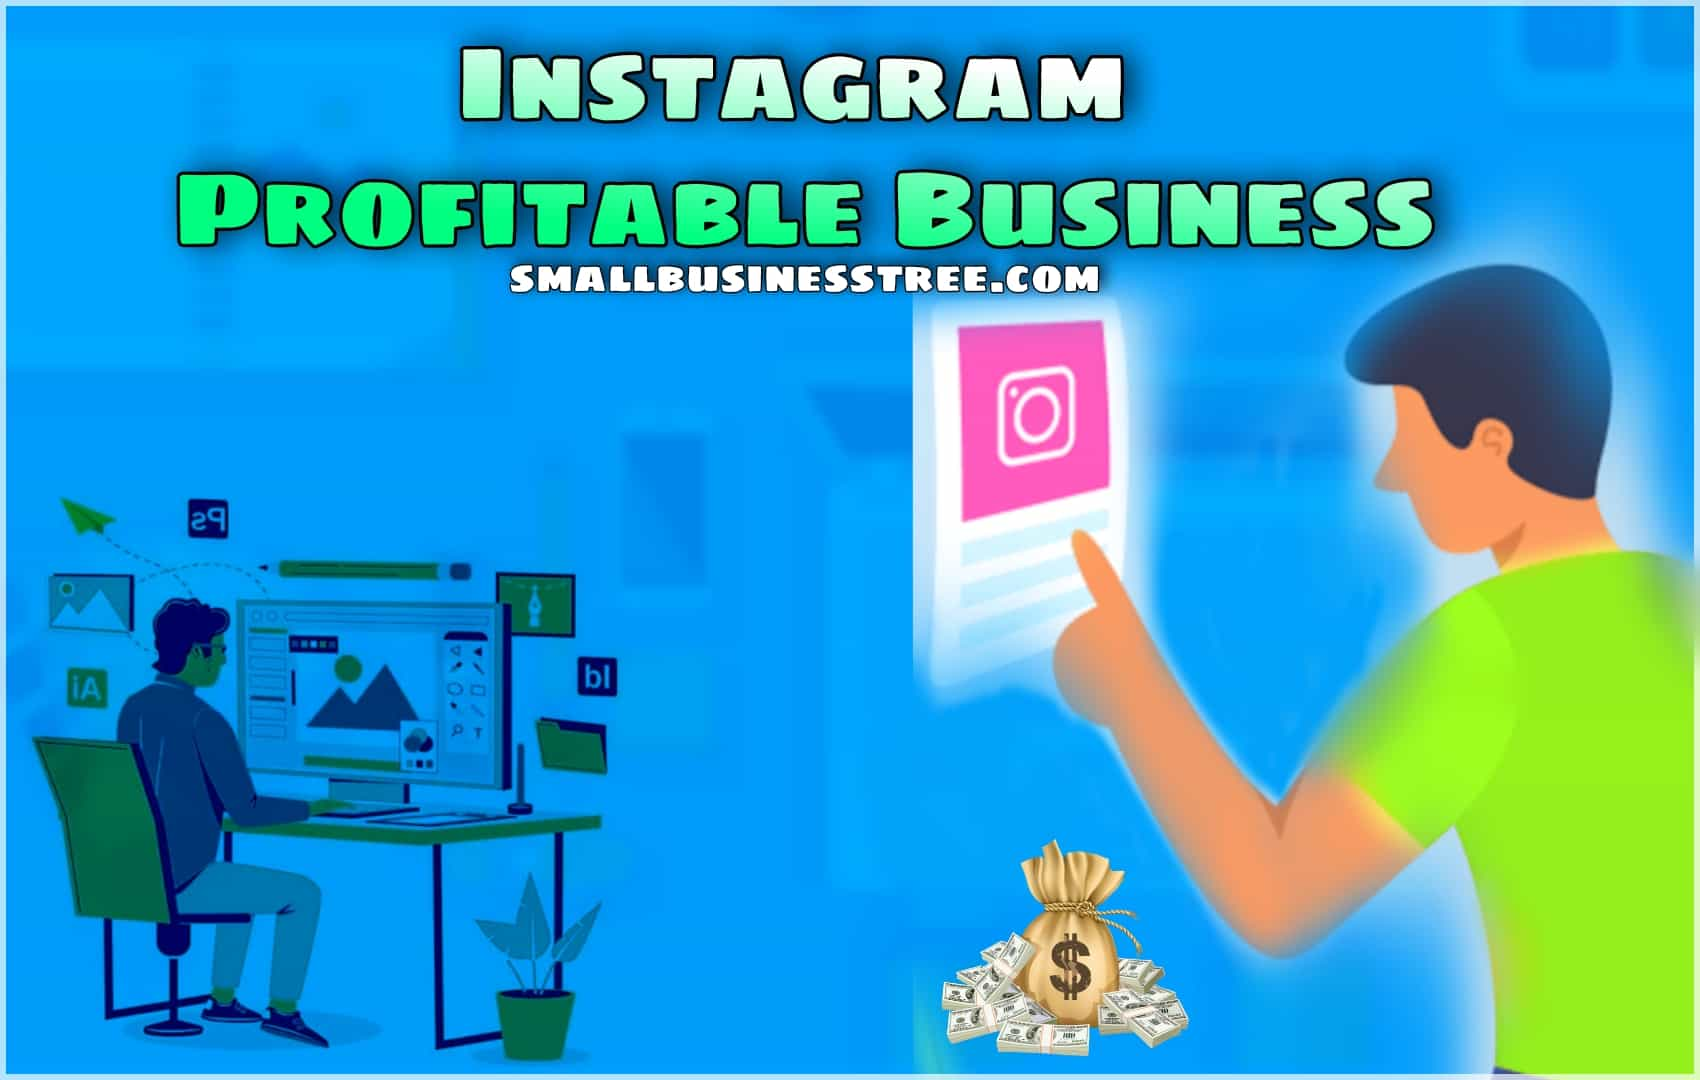 Instagram Business Ideas in USA